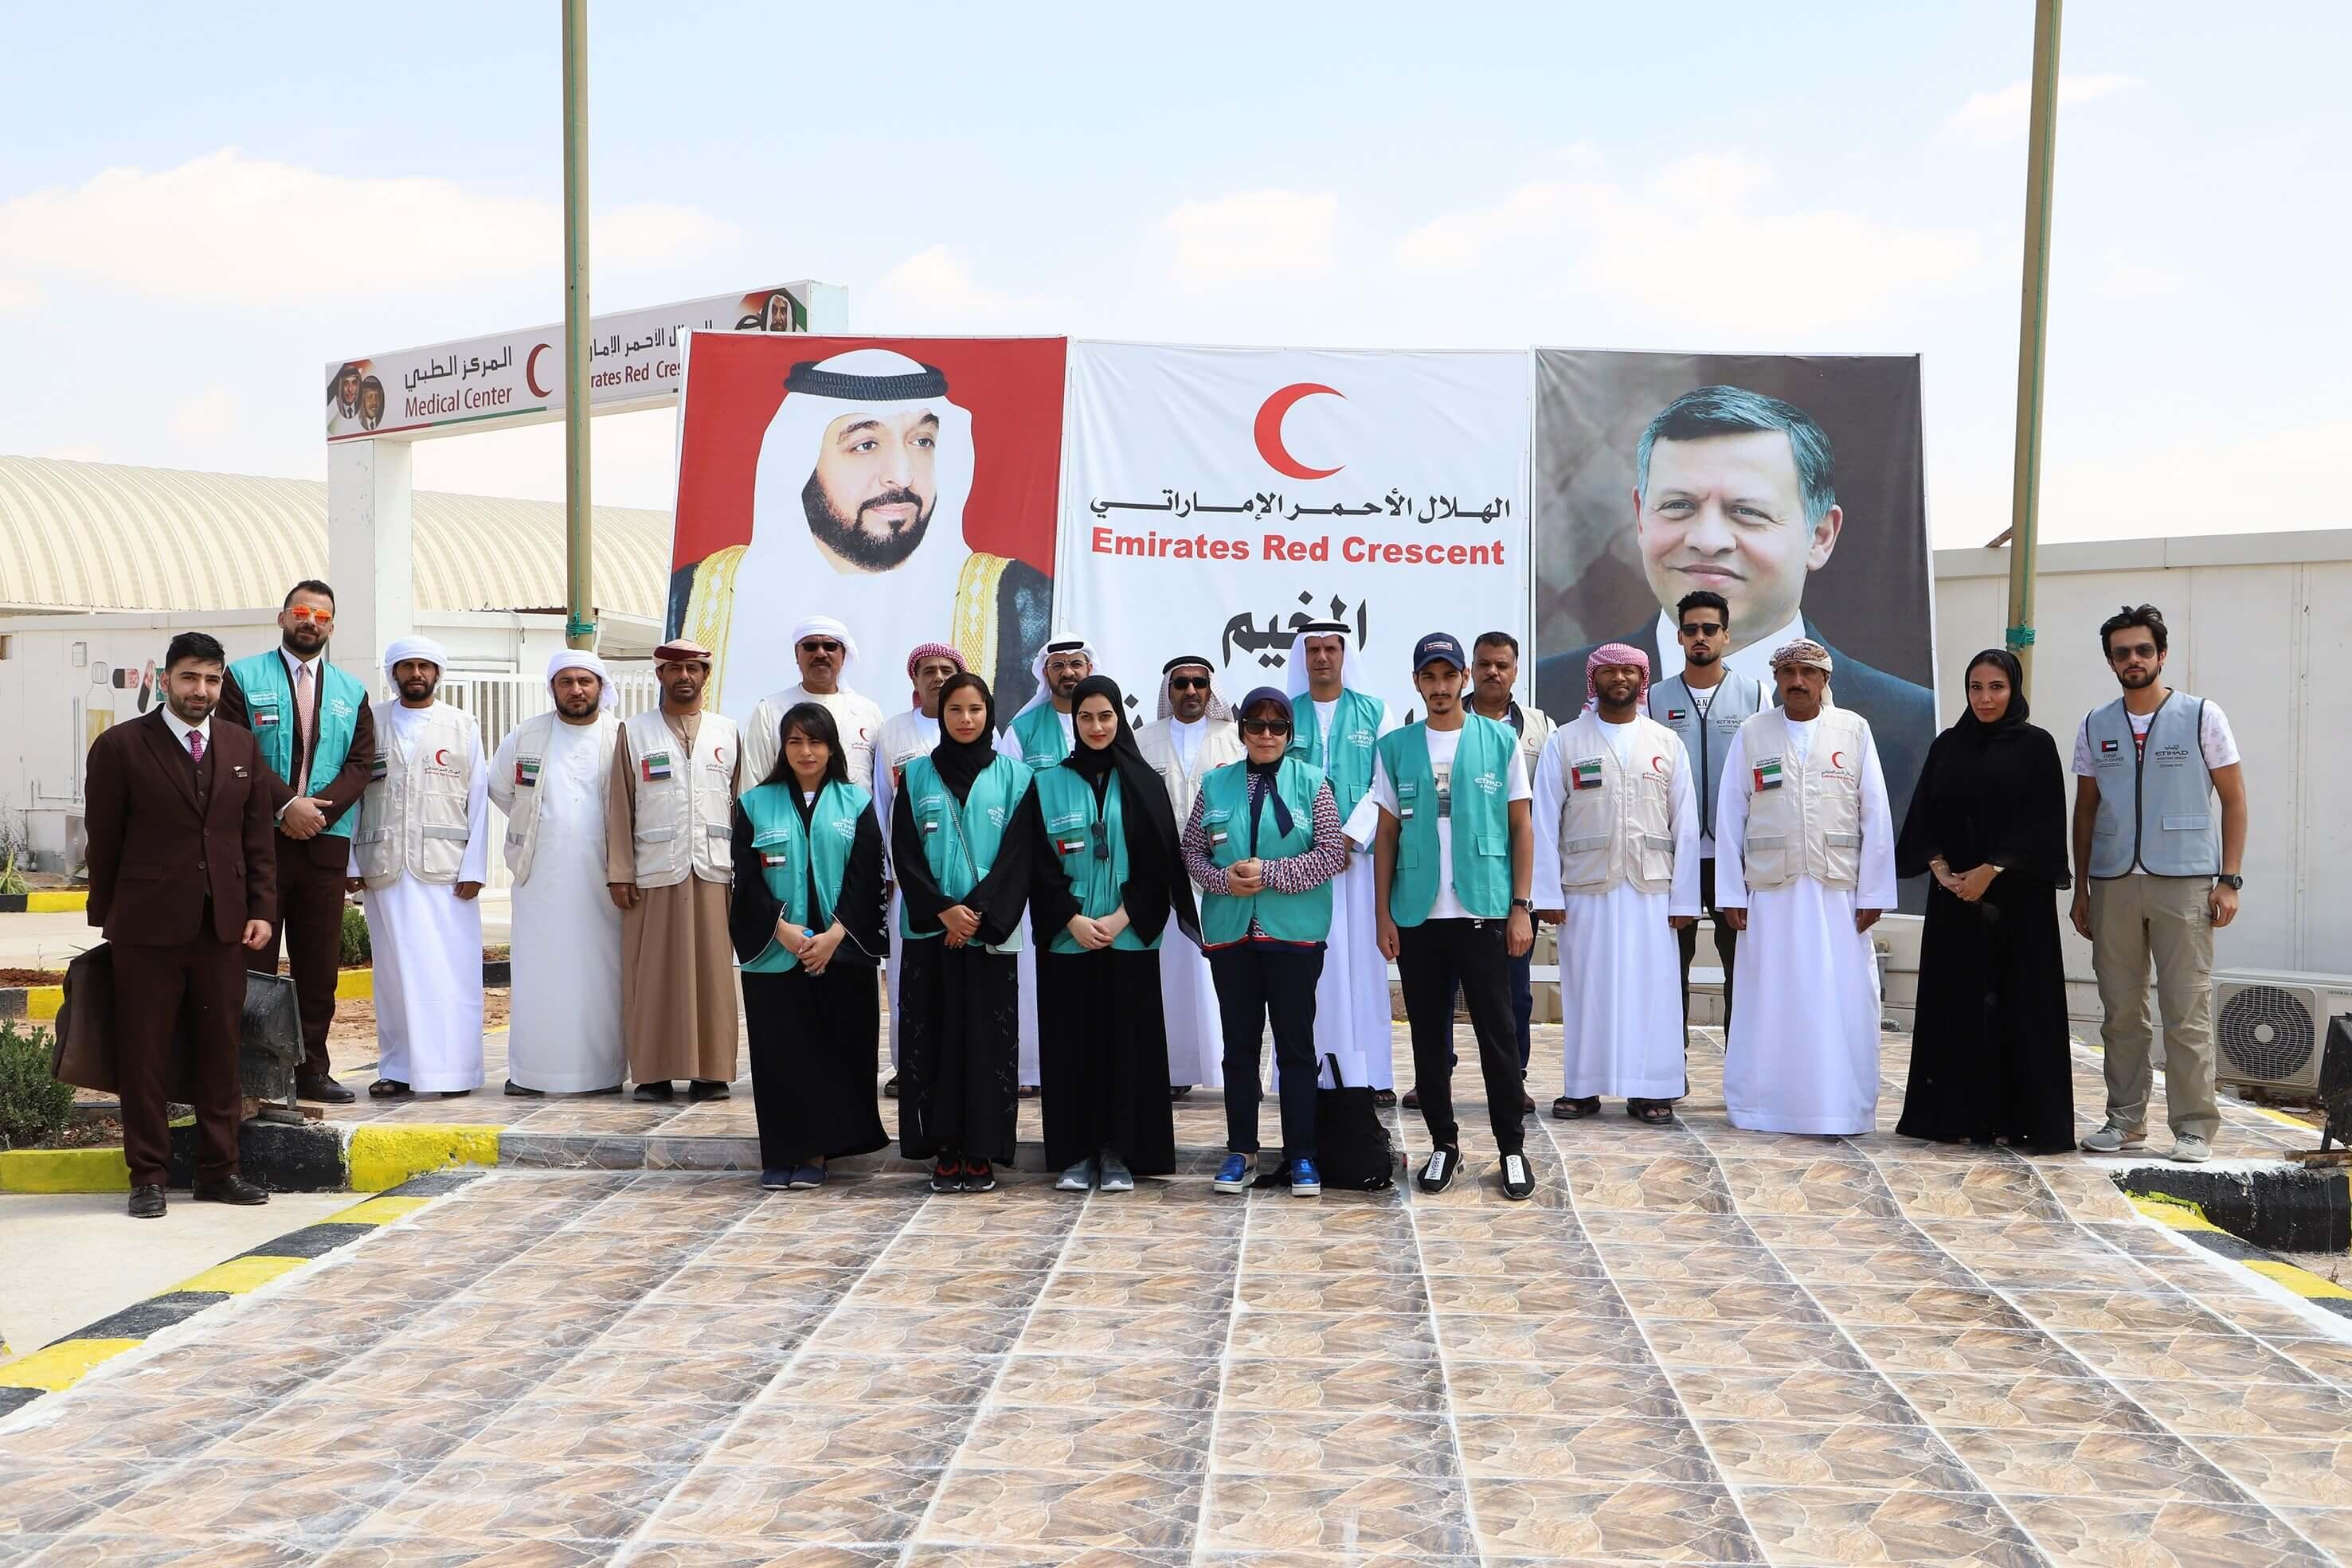 Etihad Airways marks UN World Refugee Day by helping Syrian refugees in Jordan